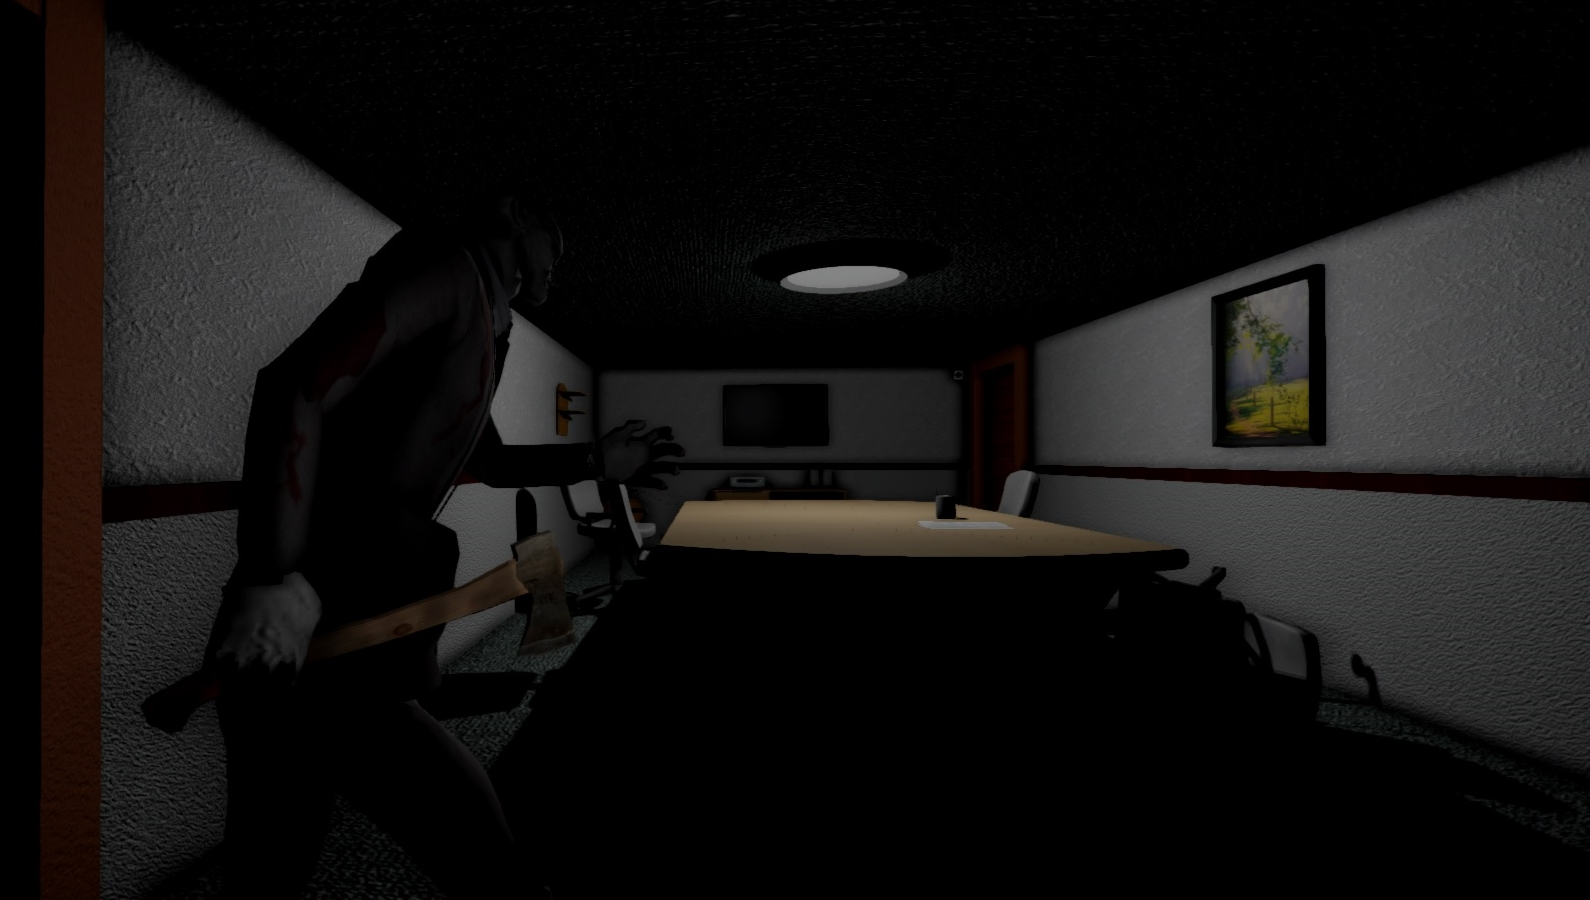 Shadows 2: Perfidia Screenshot 2